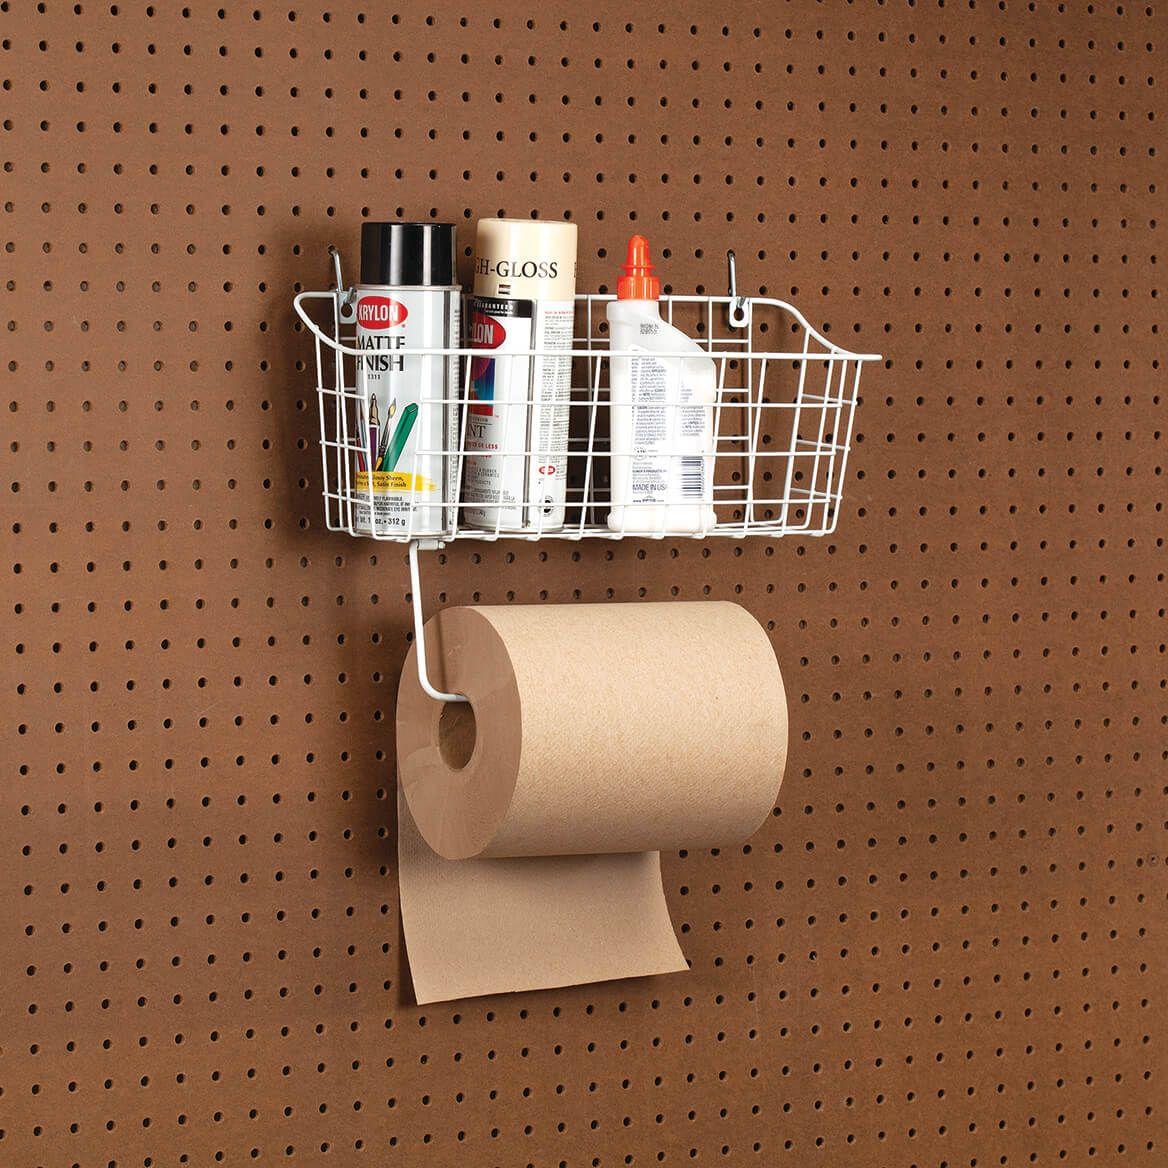 Wall Mounted Storage Basket-371921